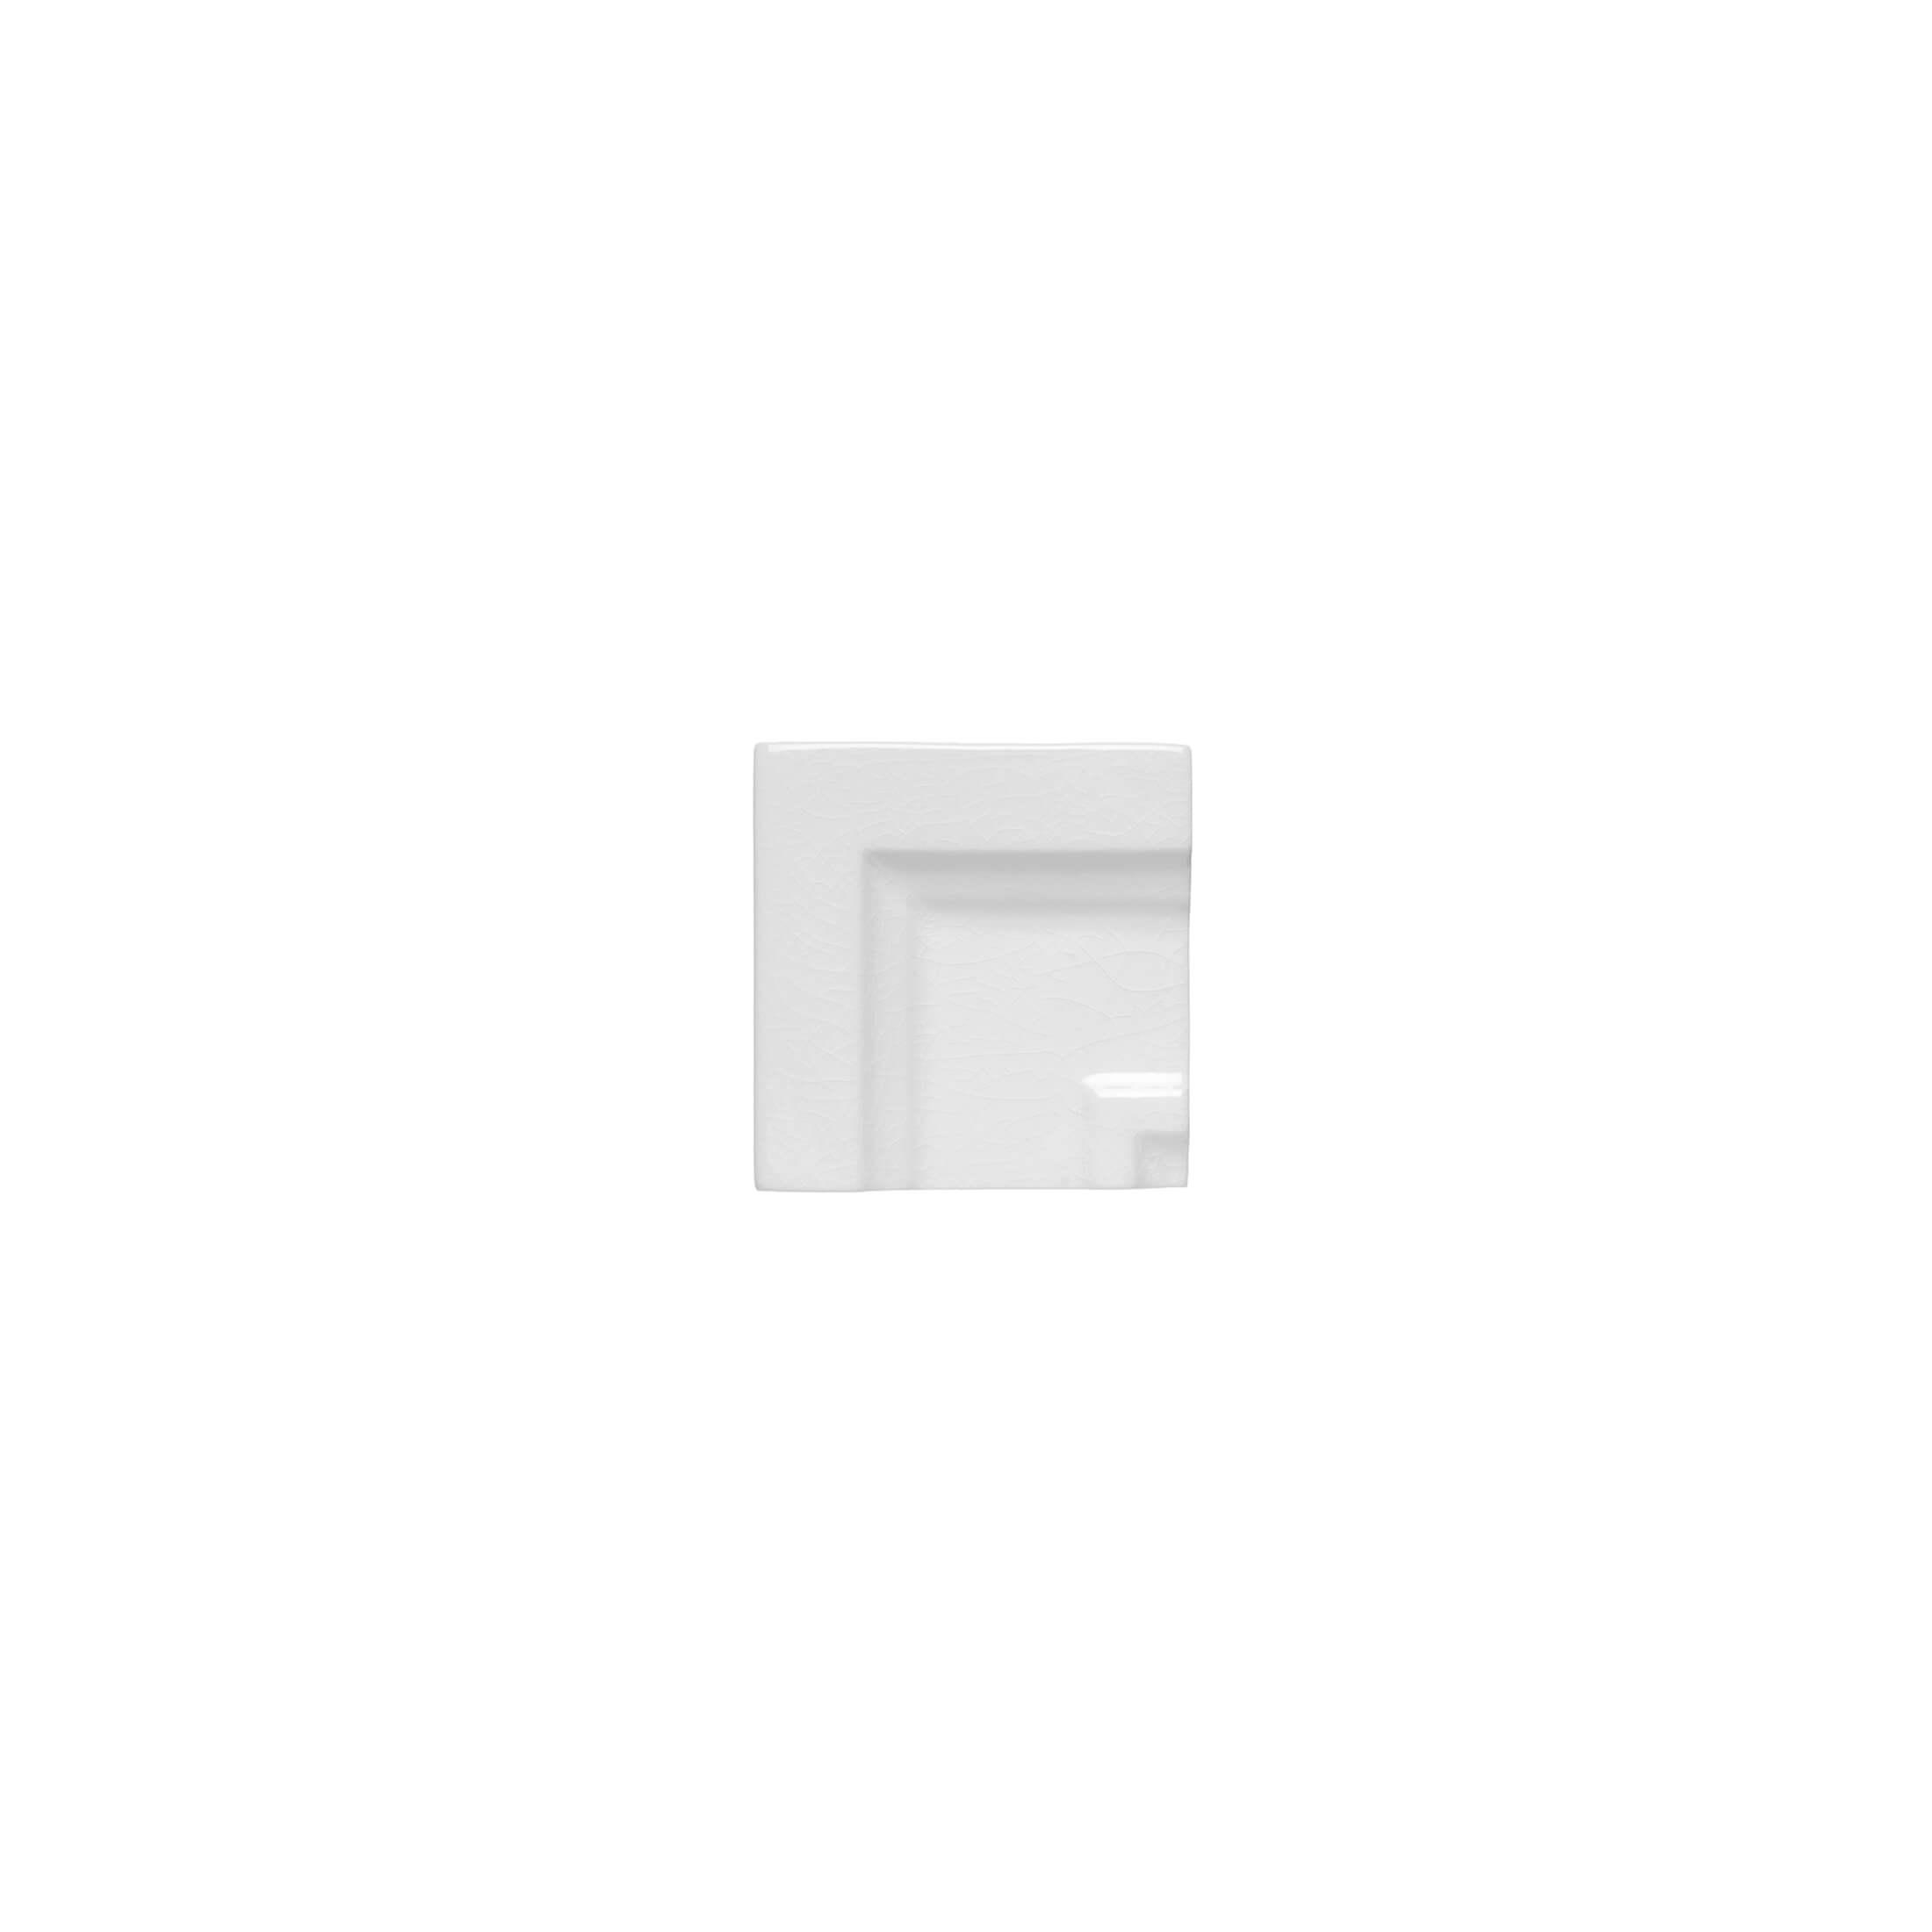 ADEX-ADMO5410-ANGULO-MARCO CORNISA CLASICA C/C -7.5 cm-15 cm-MODERNISTA>BLANCO